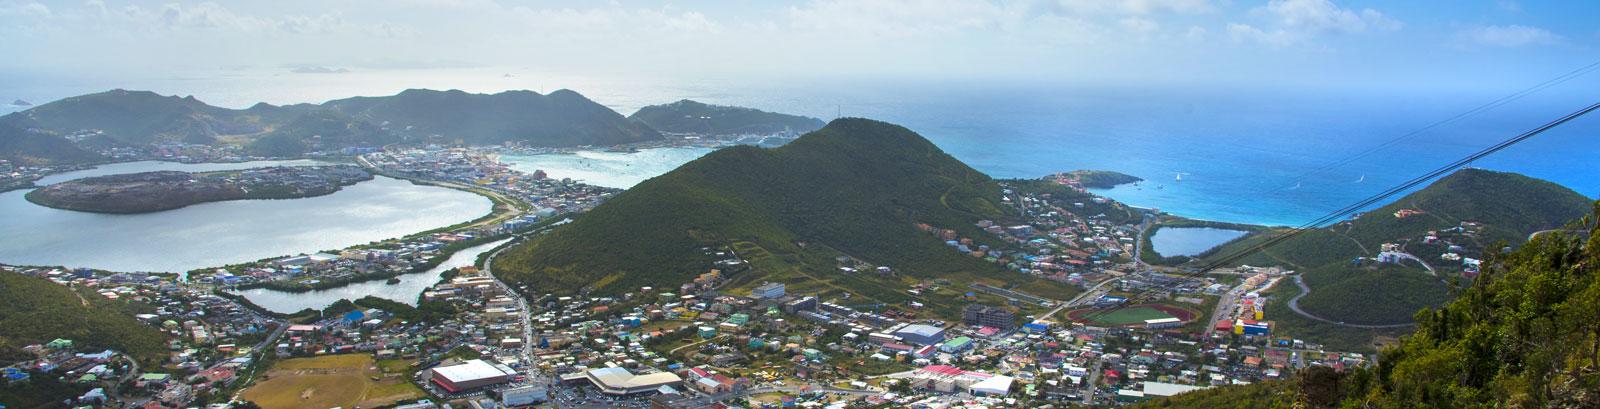 Geography of St. Maarten, Simpson Bay Resort, Marina & Spa